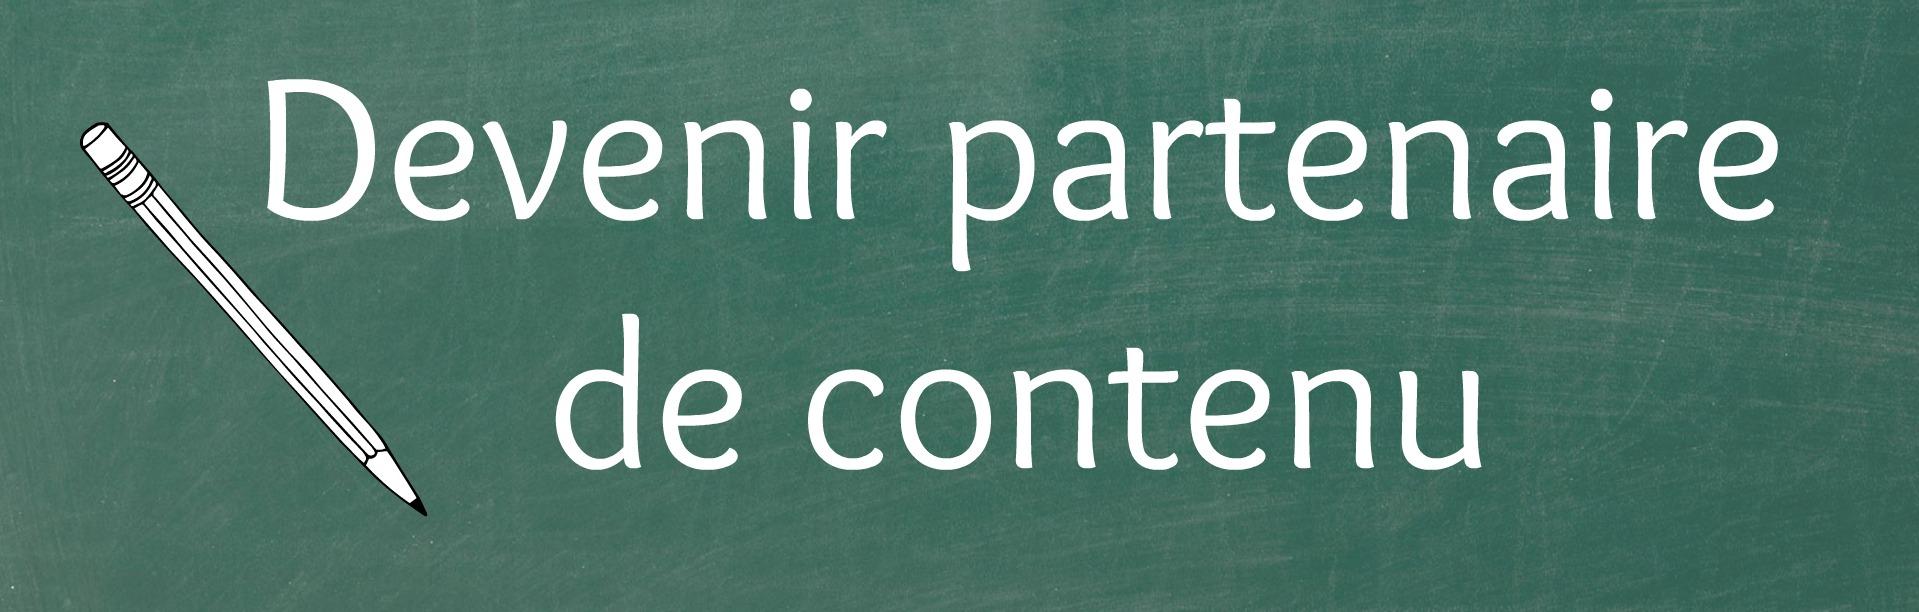 devenir-partenaire-de-contenu-sosprof